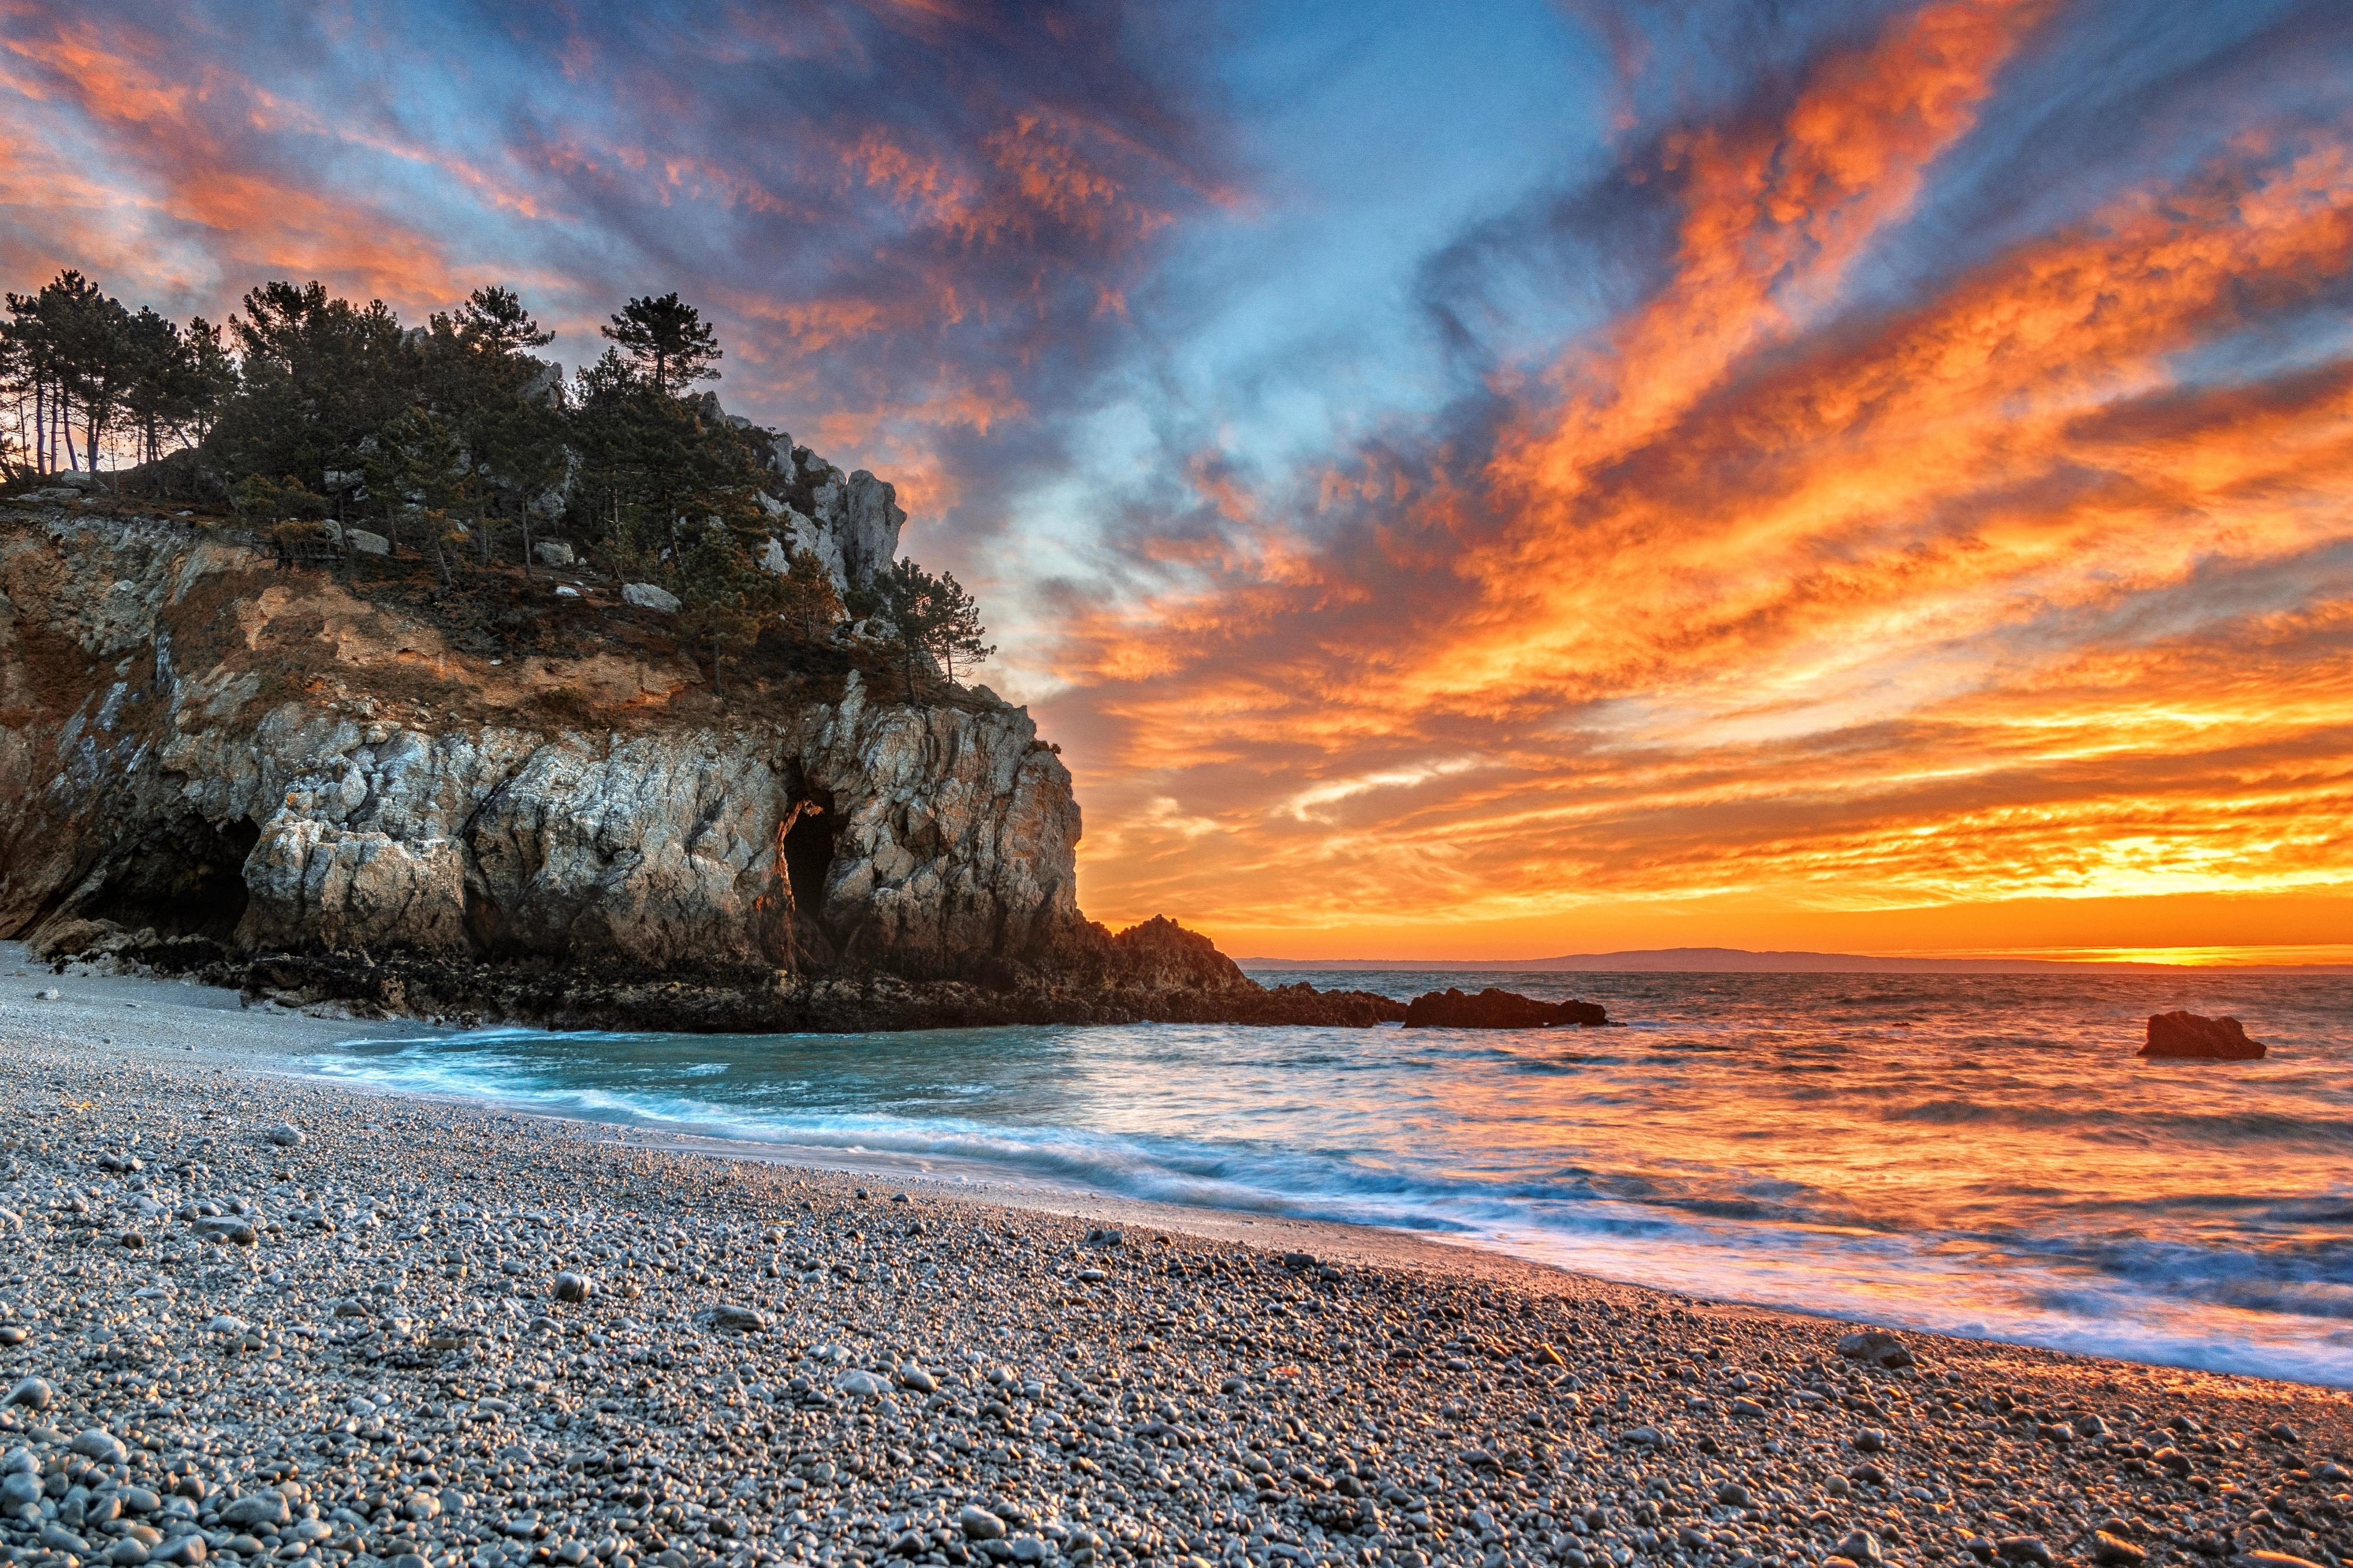 обои Залив Шалёр, Канада, закат, море картинки фото